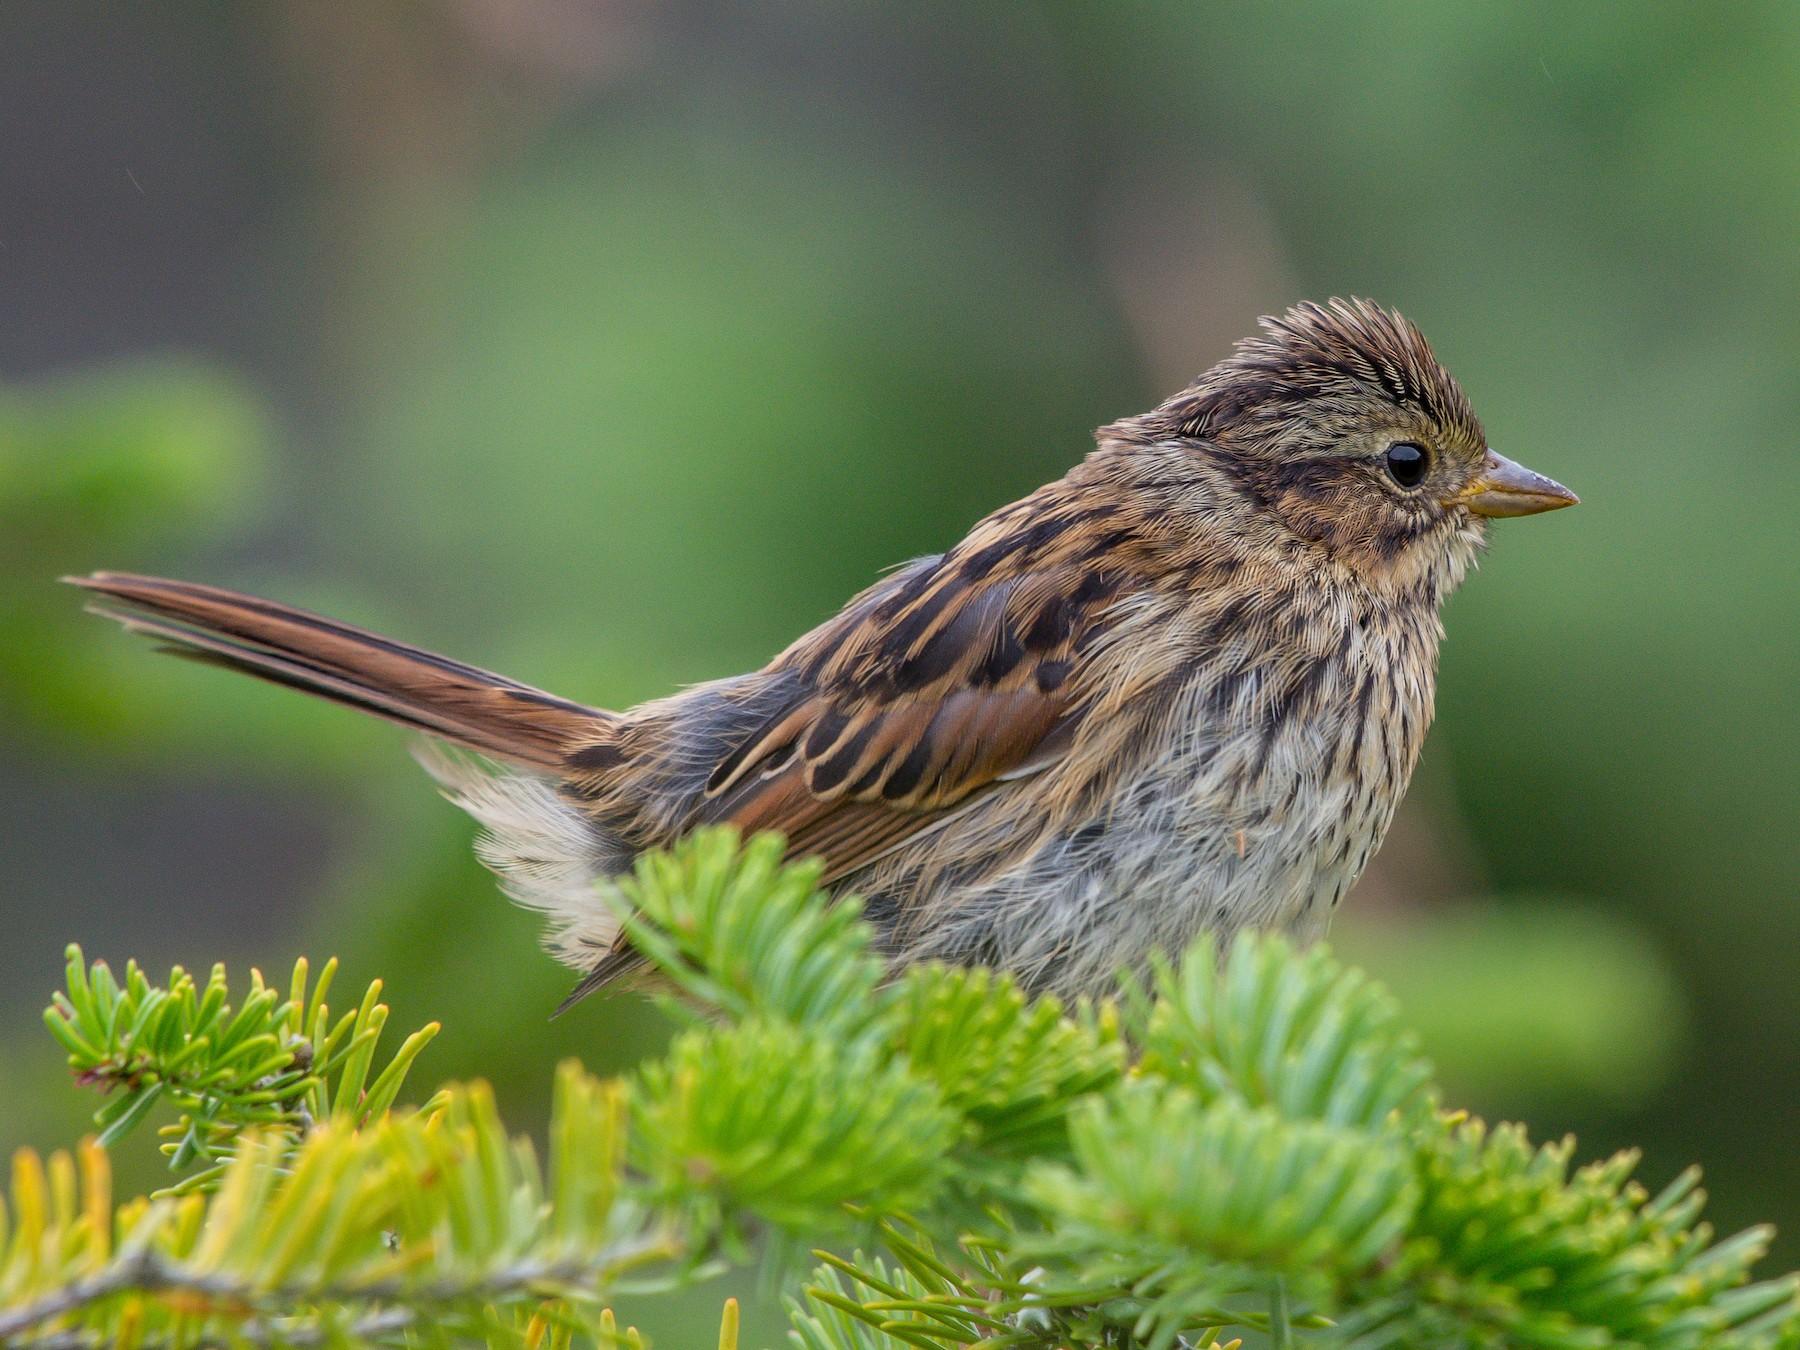 Swamp Sparrow - Frank King